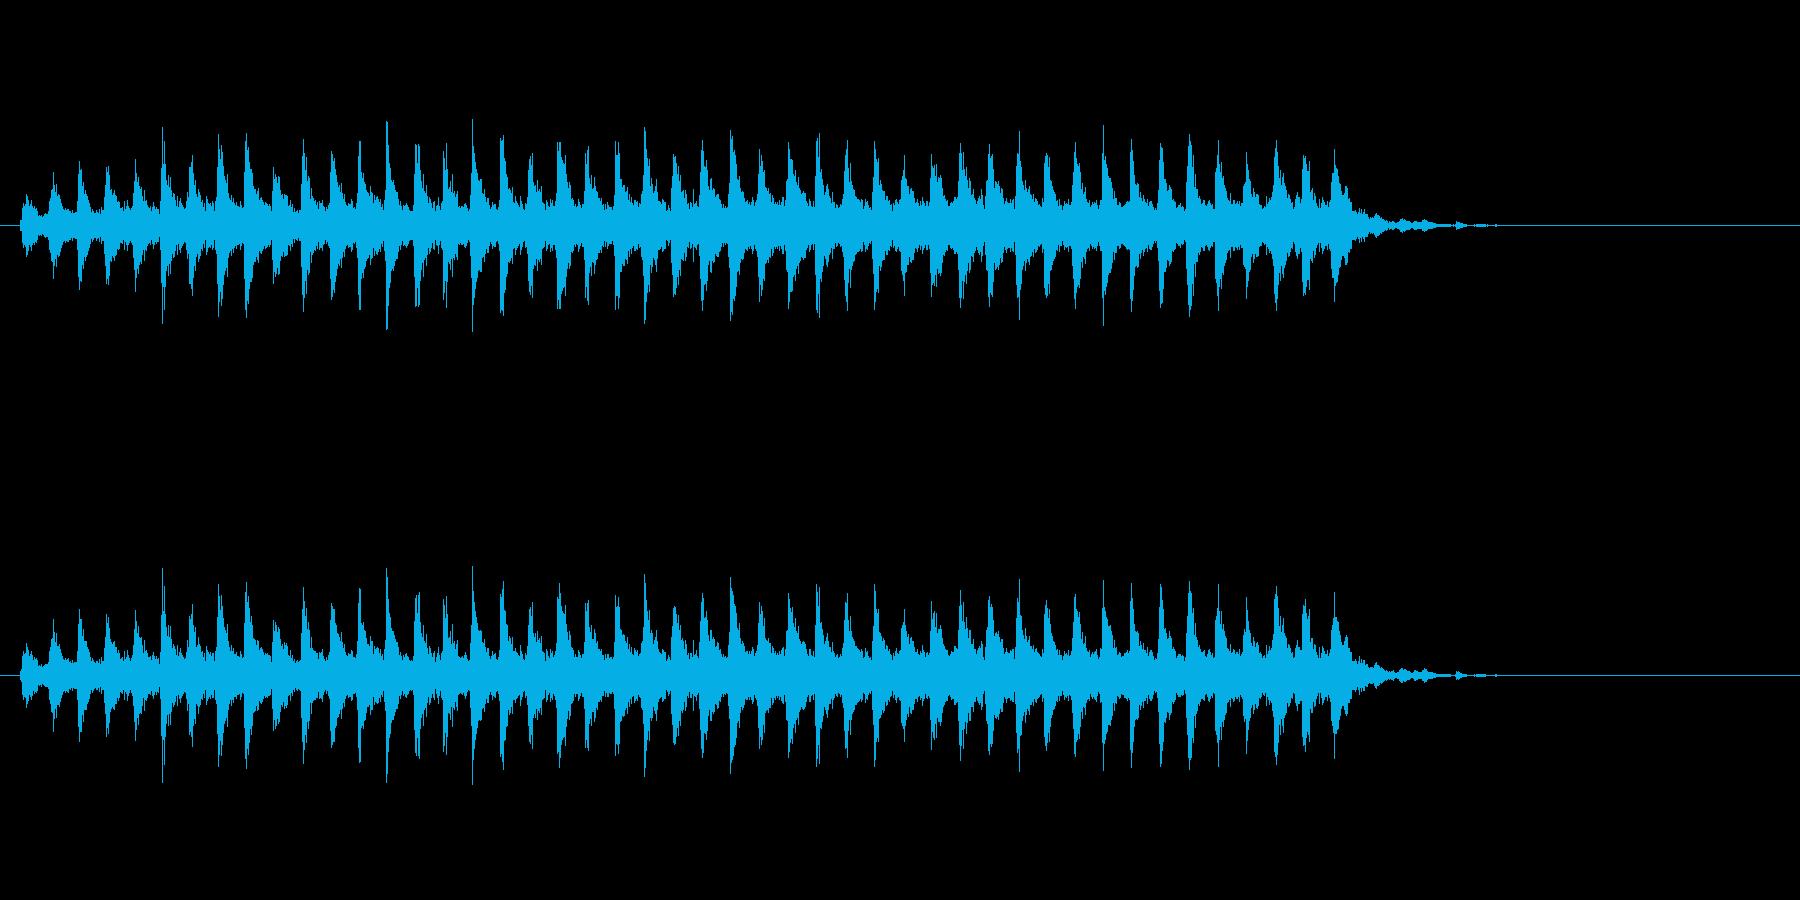 SLEIGH BELLS、JING...の再生済みの波形